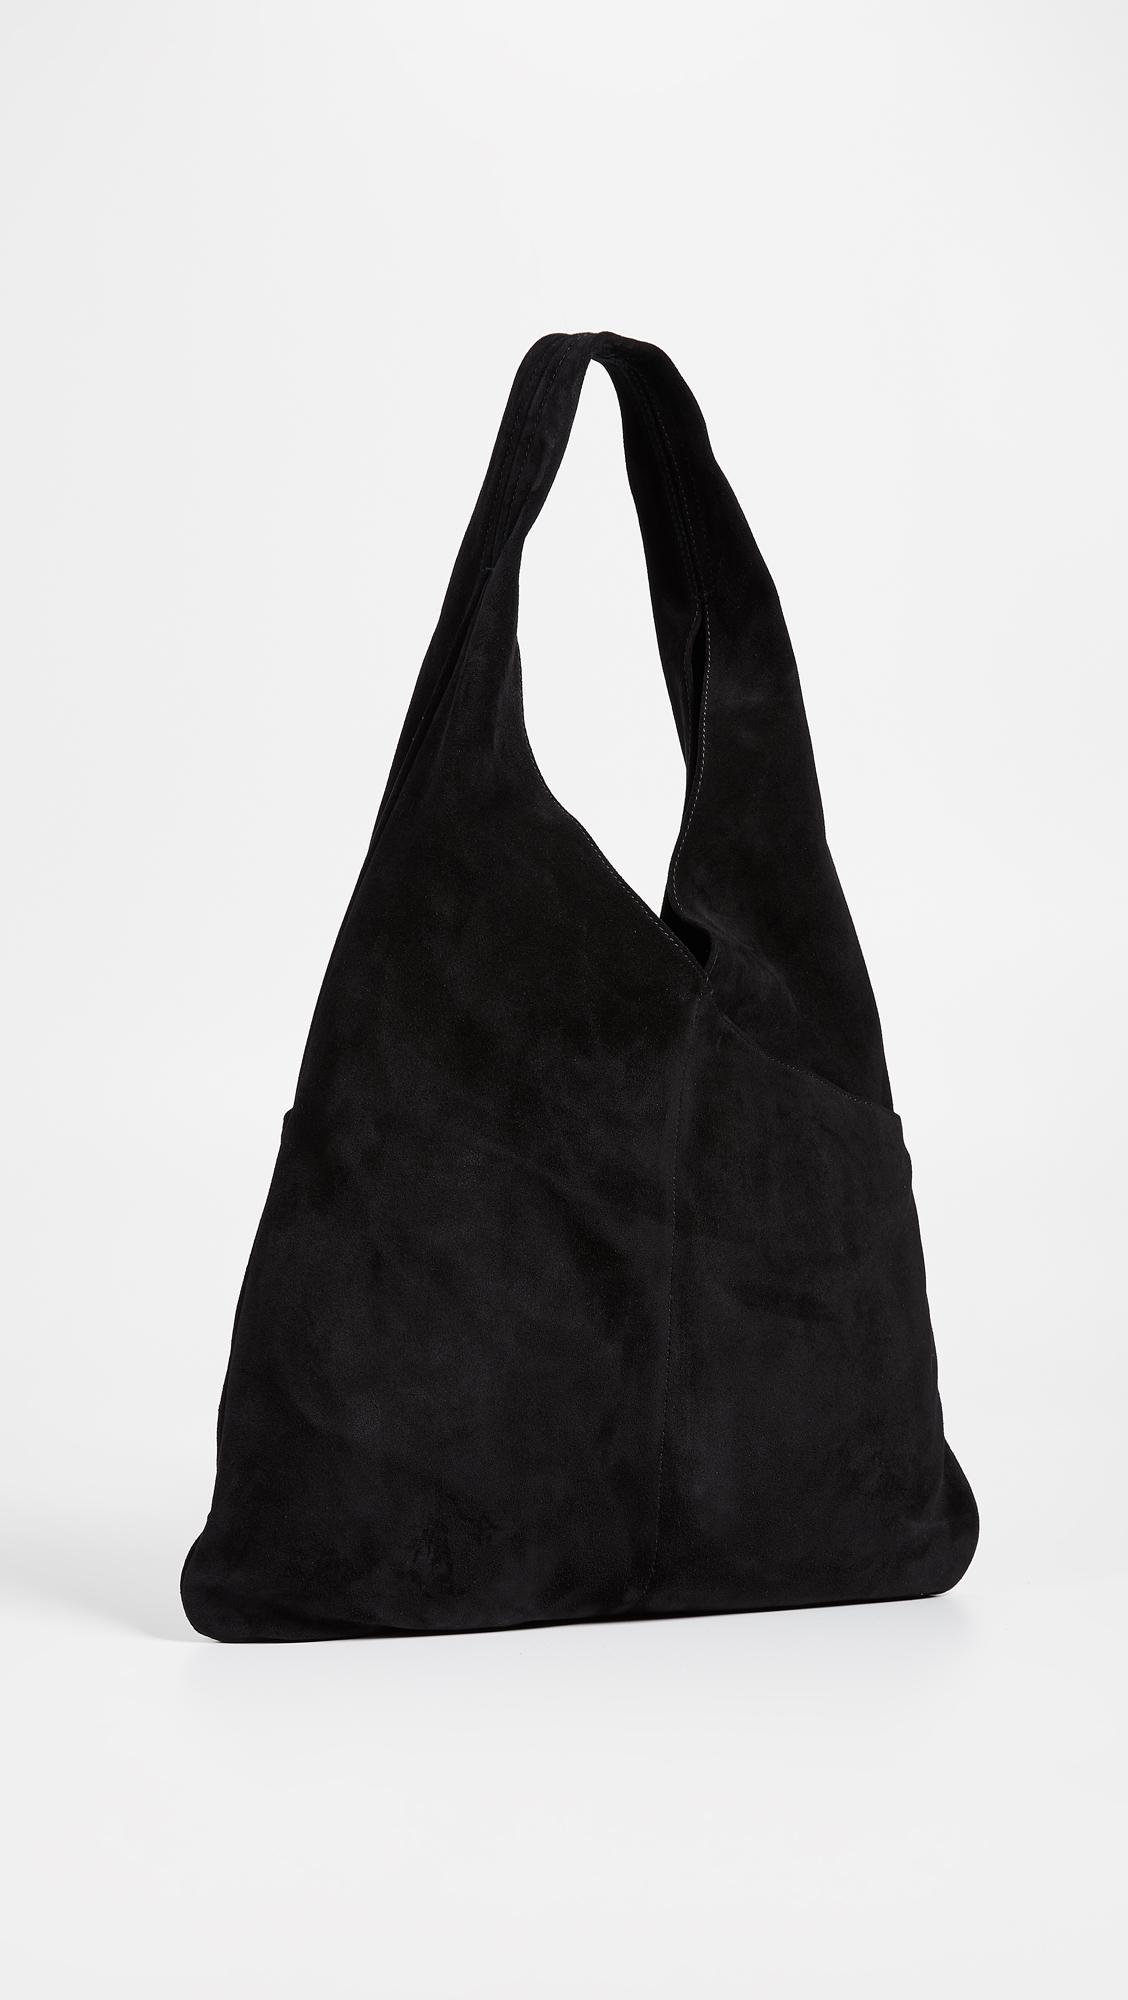 A.L.C. Leather Flat Sadie Tote in Black